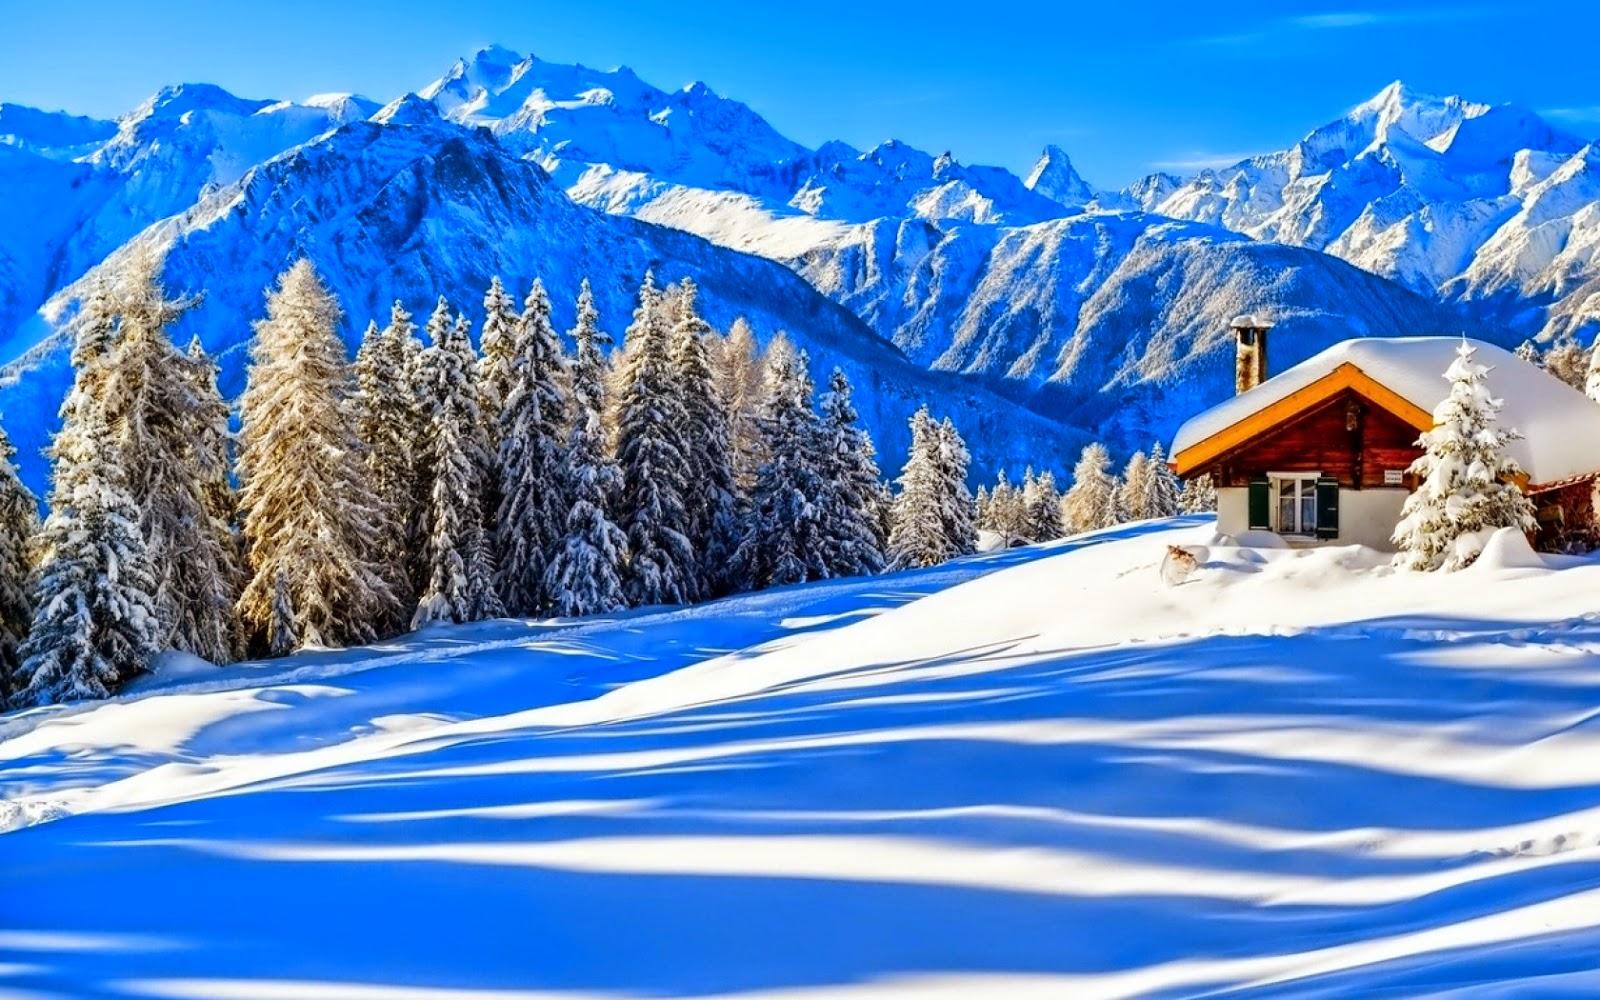 Wooden Tools Imagini Frumoase De Iarna Poze Super Misto